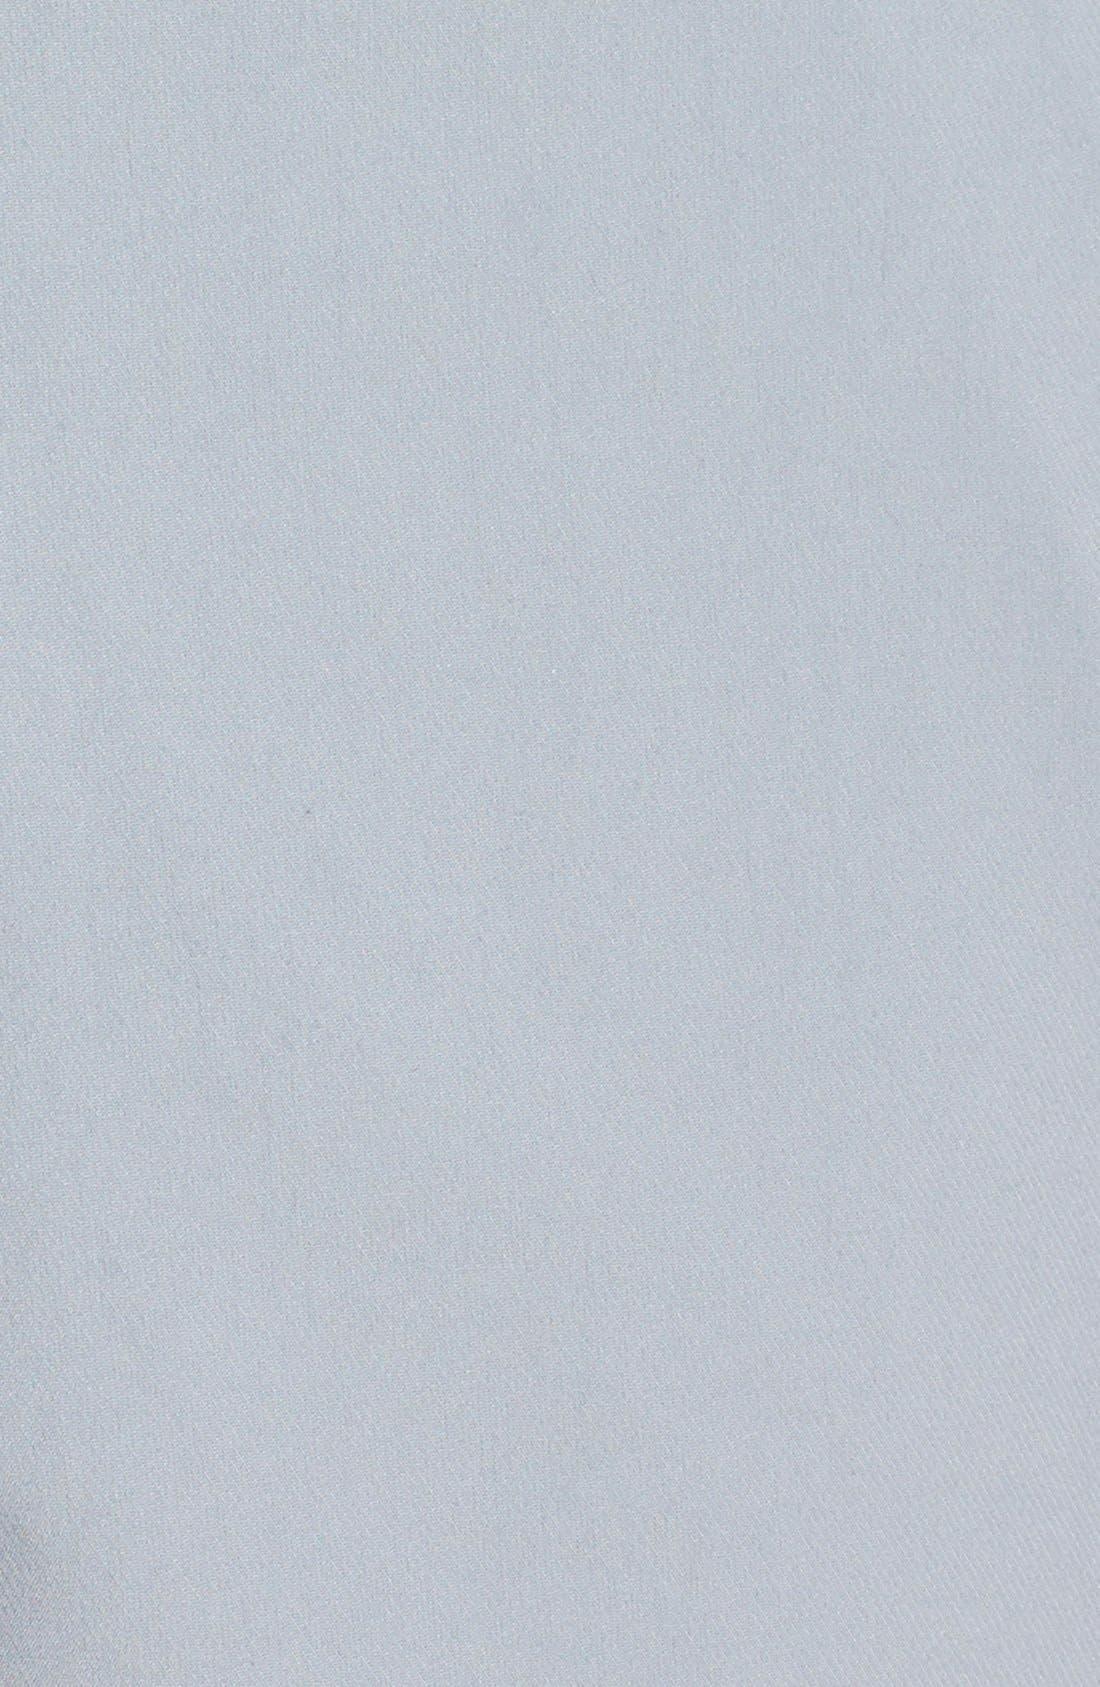 'Matchplay' Moisture Wicking Golf Shorts,                             Alternate thumbnail 5, color,                             035